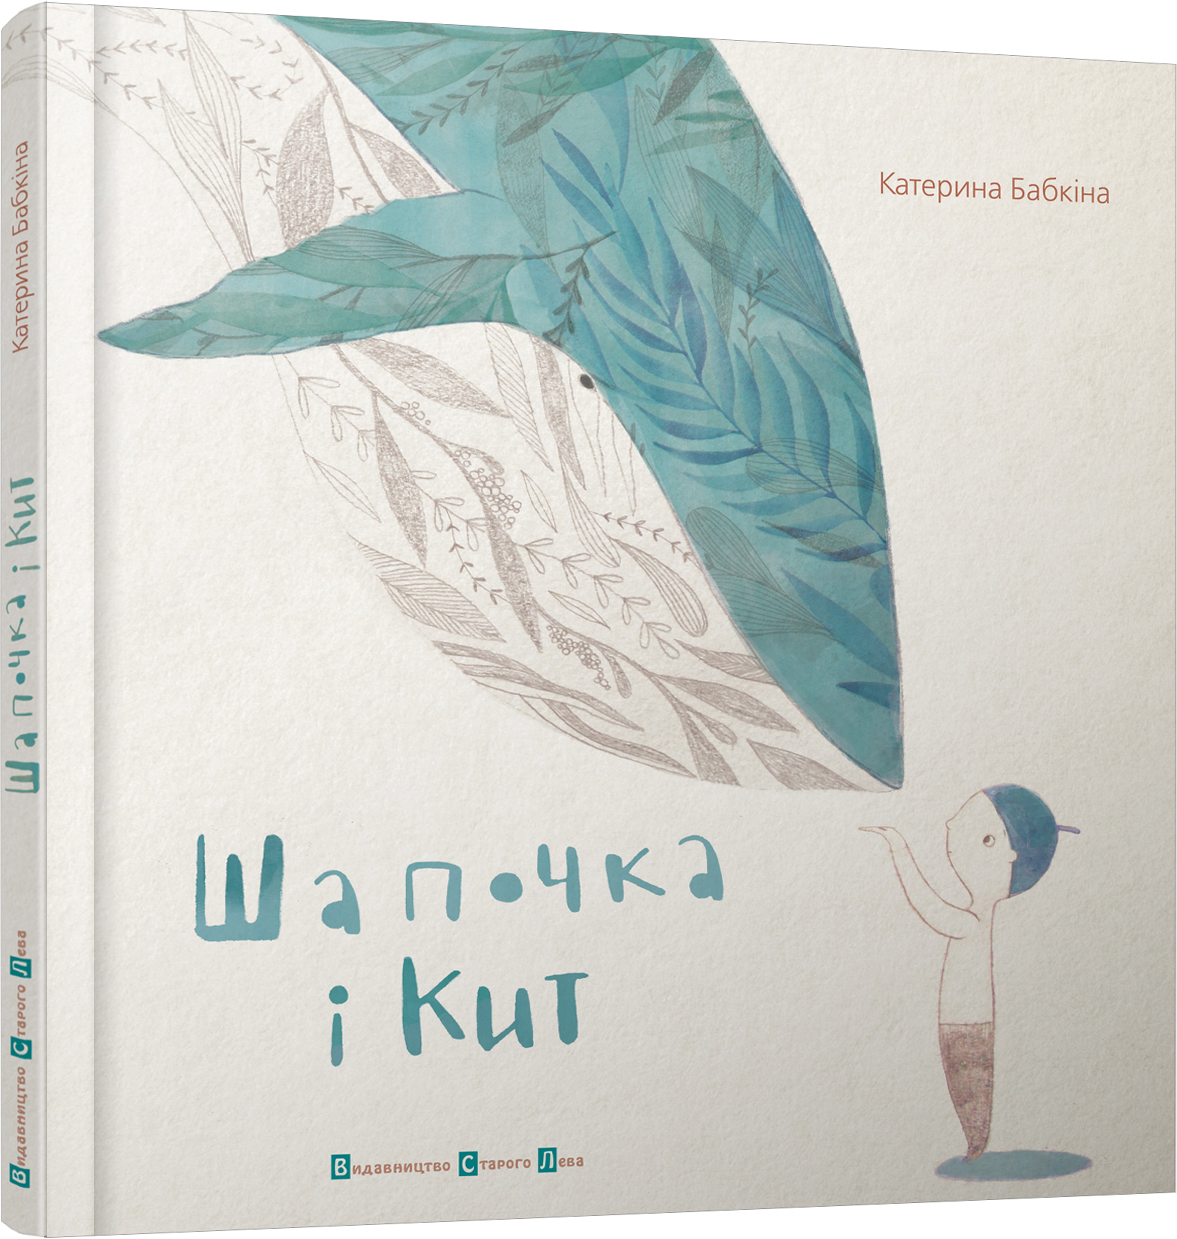 WoMo-книга: Шапочка і кит